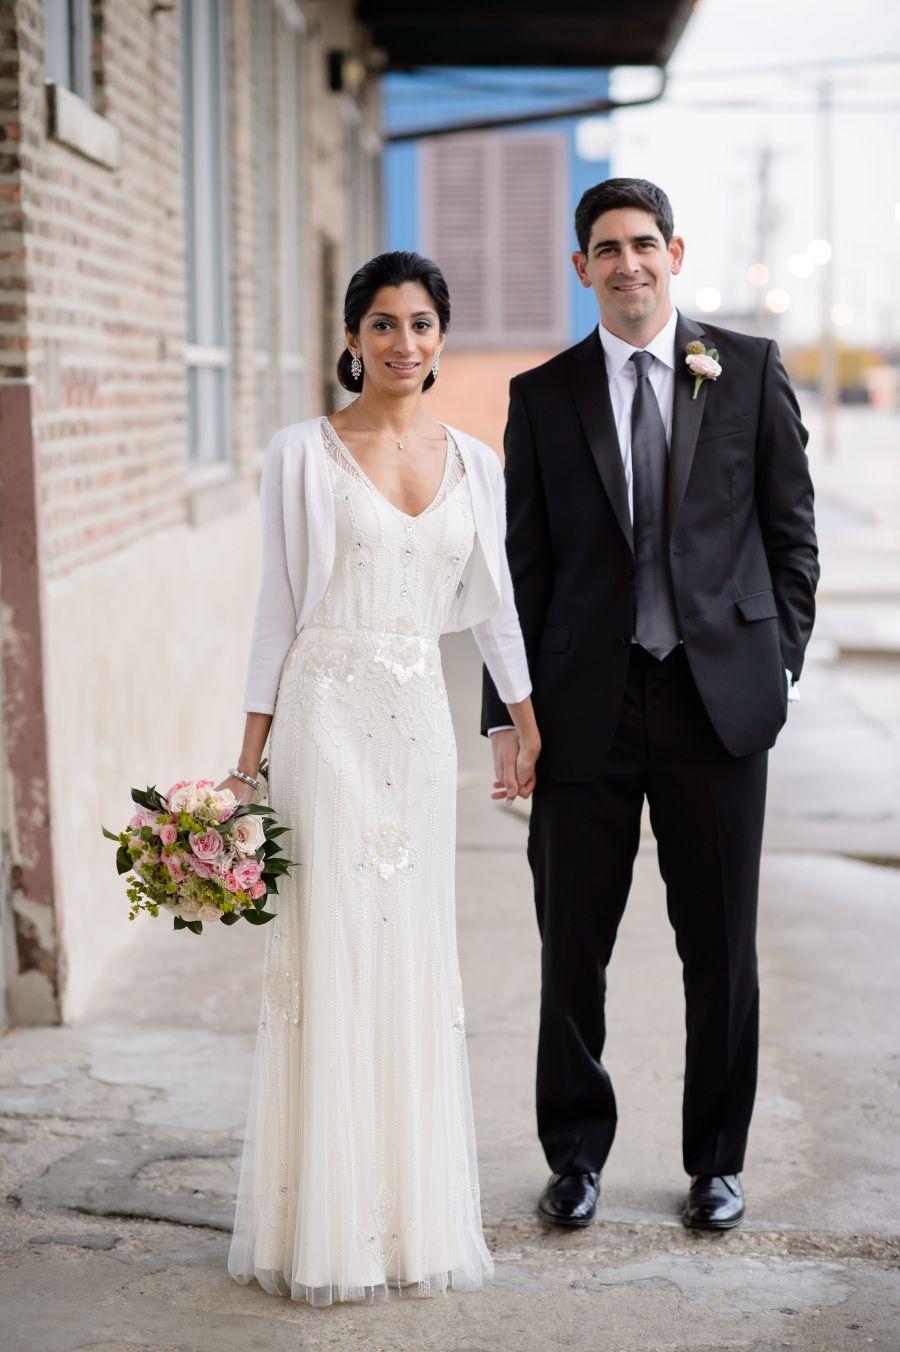 Chicago wedding dresses  Industrial Chic Chicago Wedding  WHAT A TREAT  Pinterest